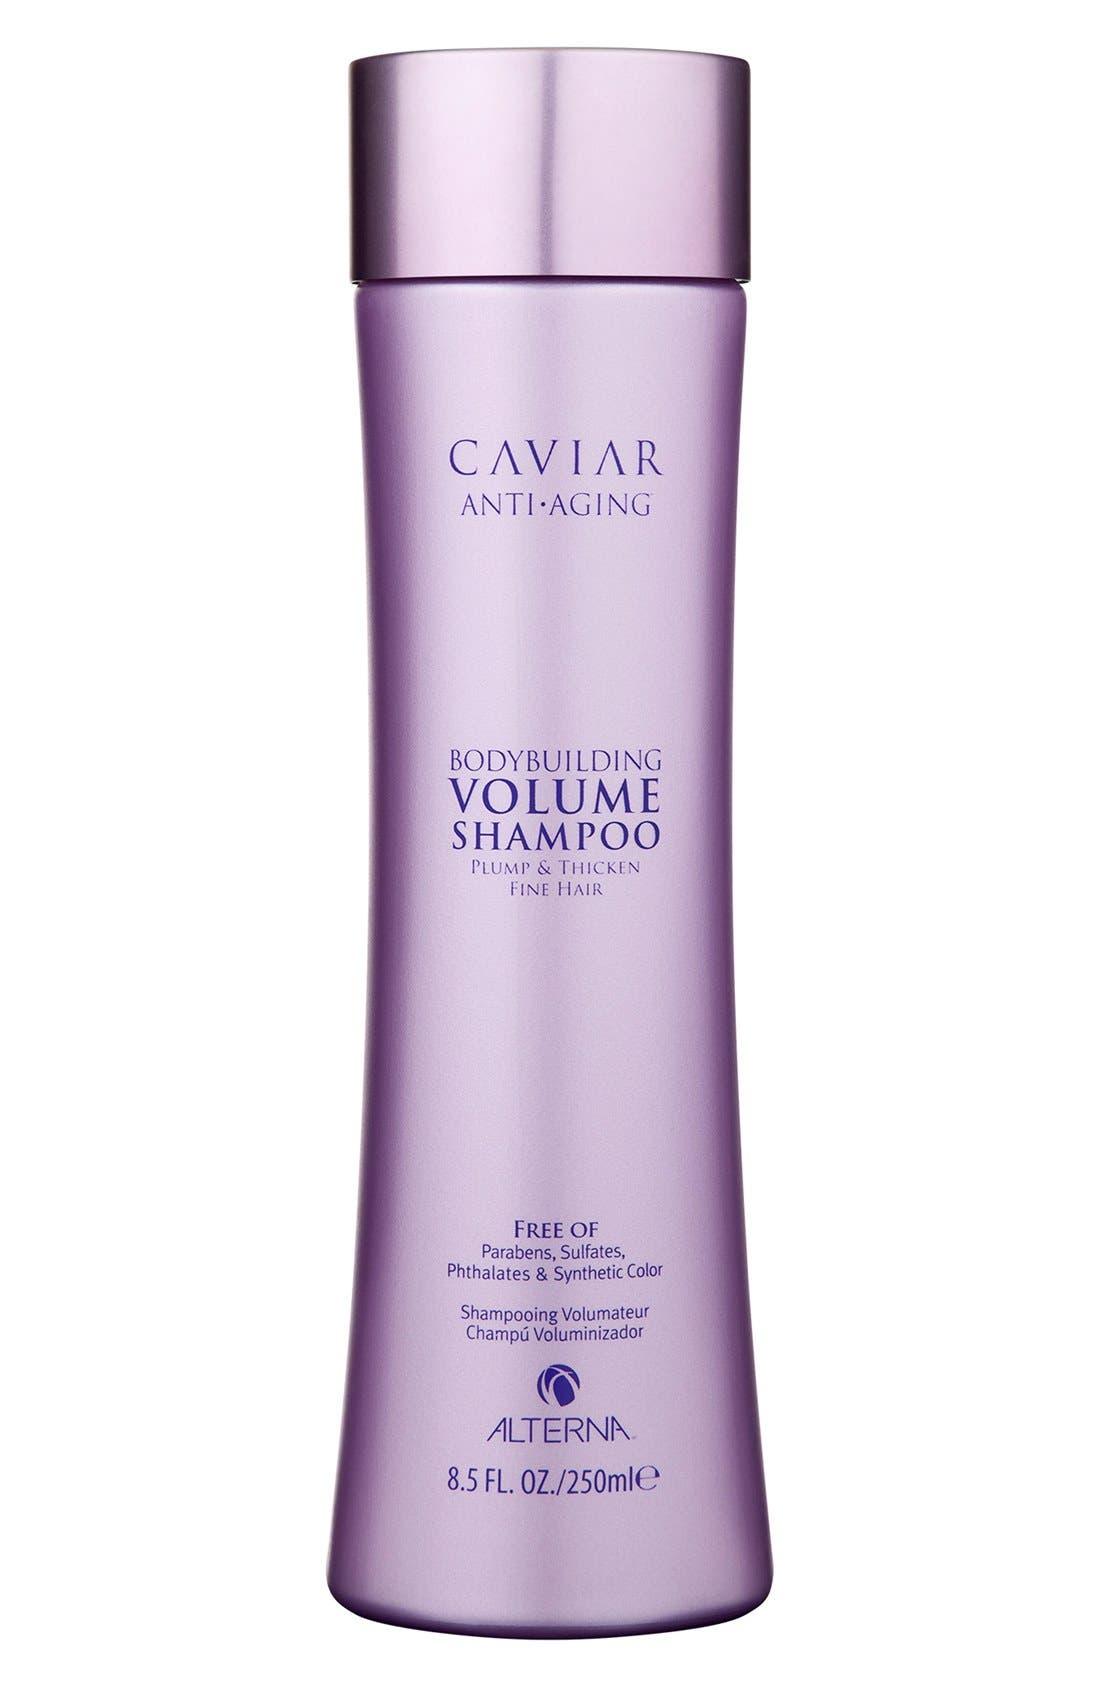 ALTERNA® Caviar Anti-Aging Bodybuilding Volume Shampoo